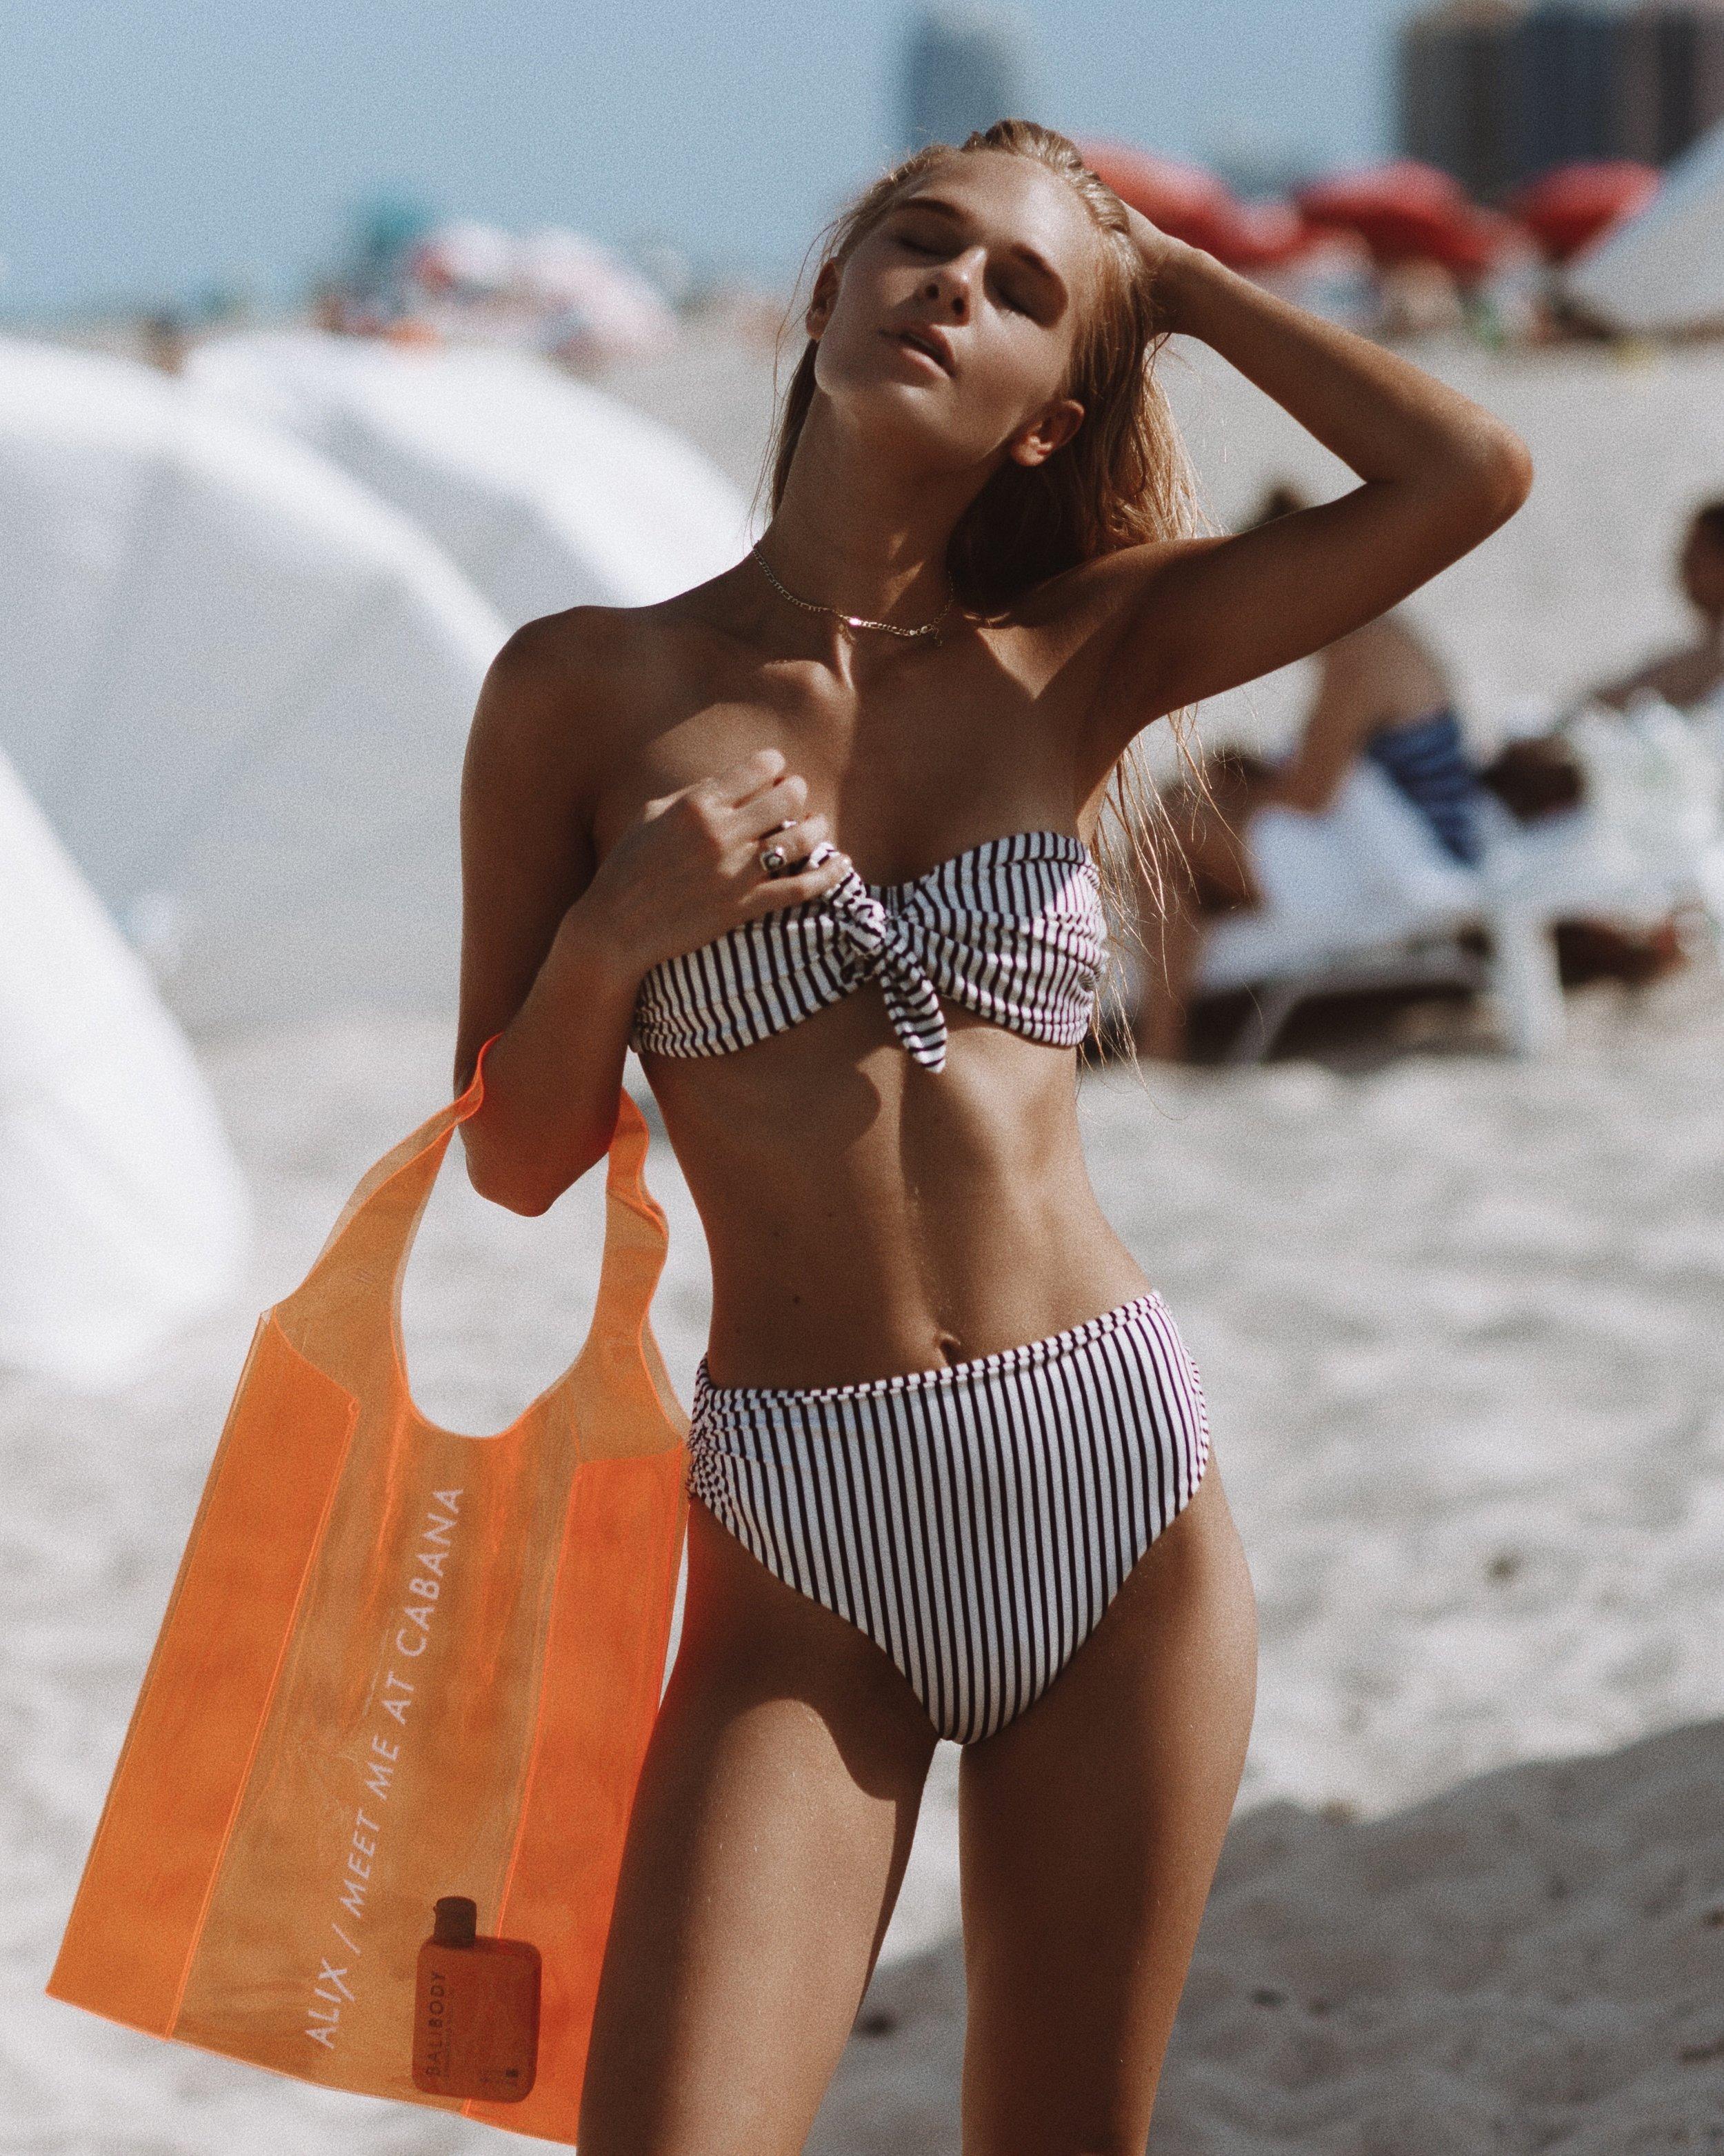 swim-week-miami-airbrush-tan.jpg